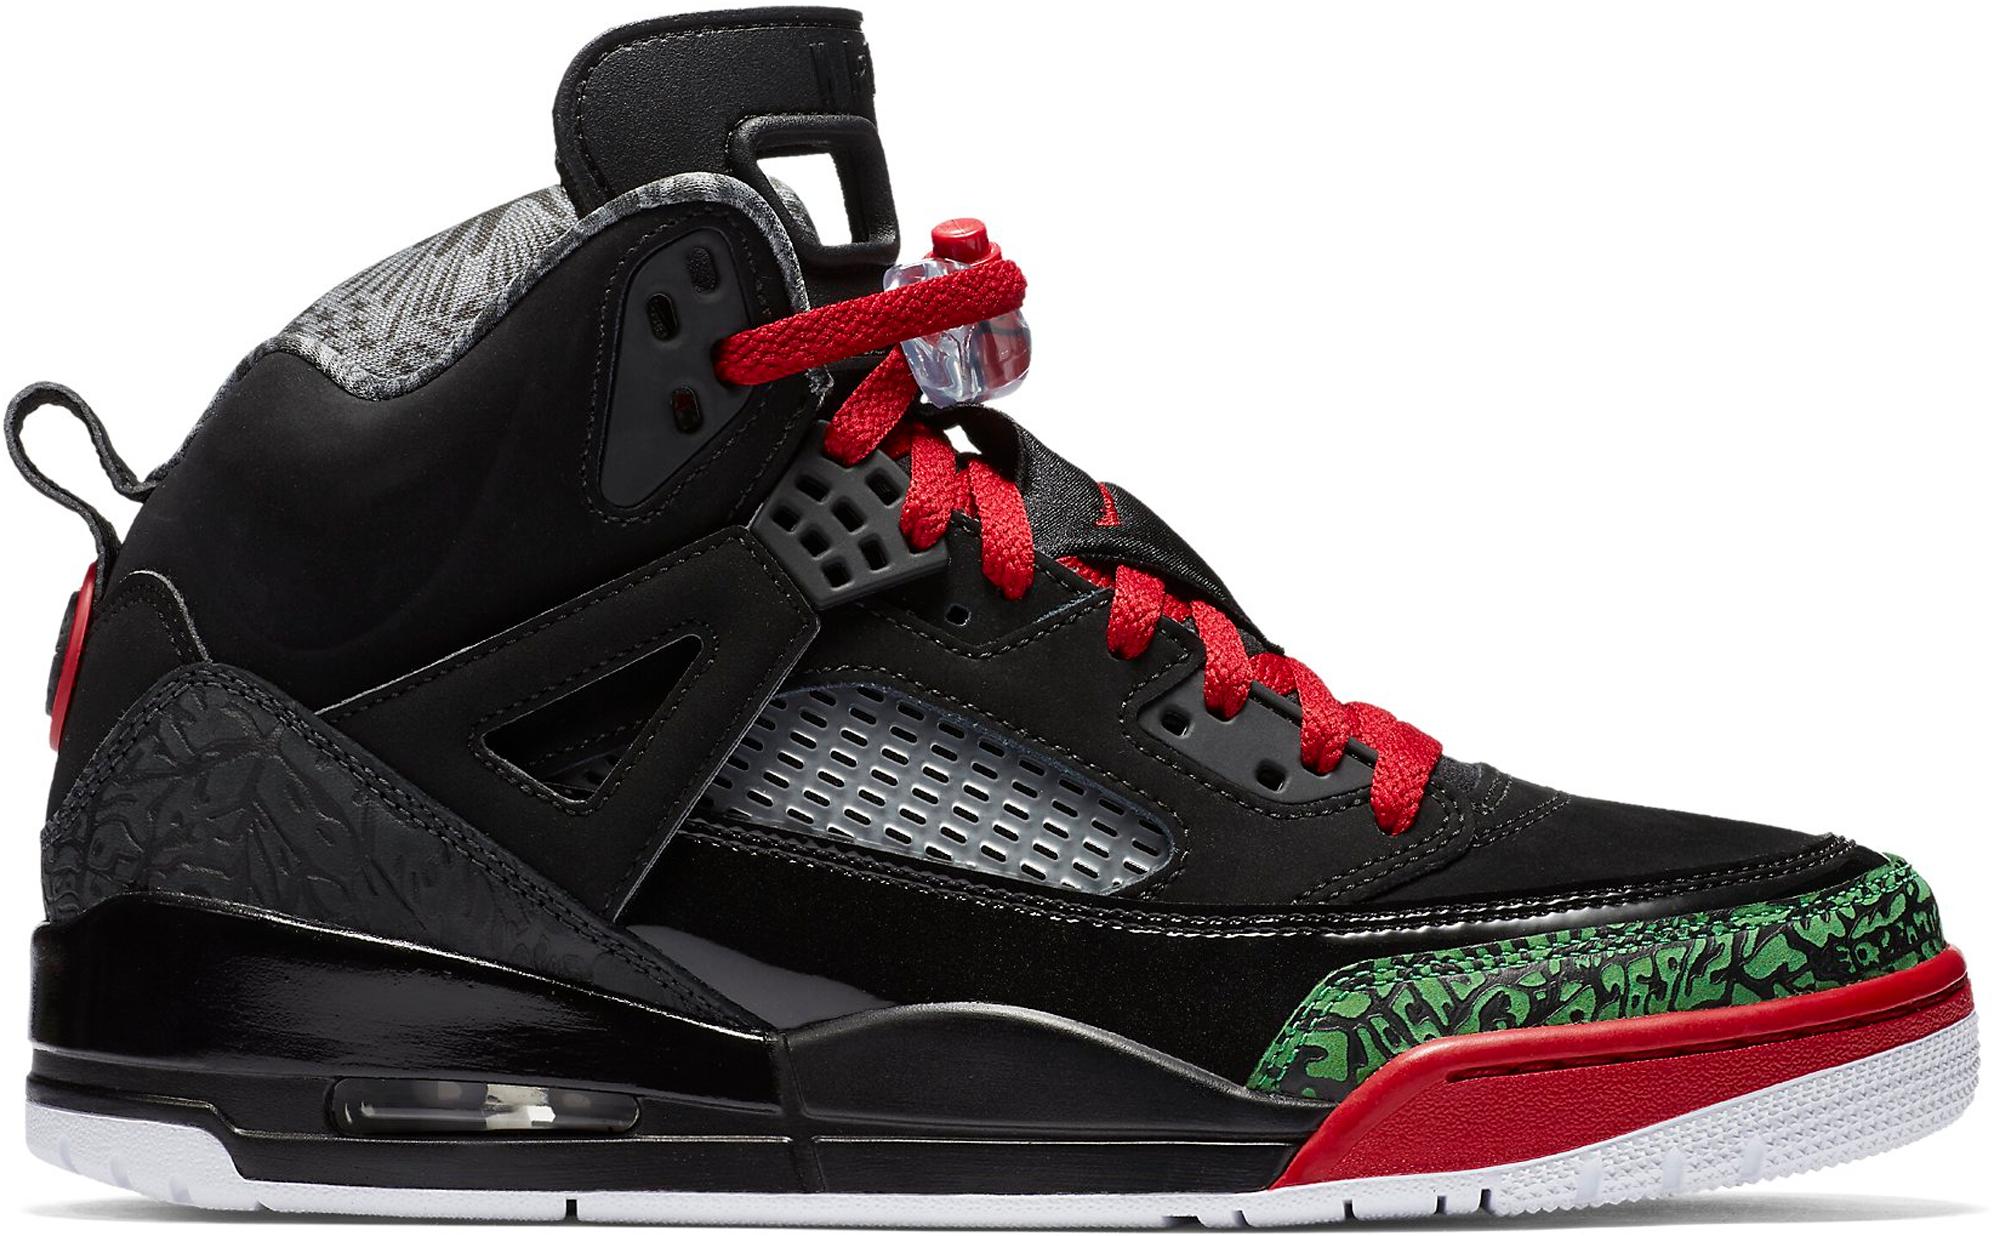 Jordan Spizike Black Varsity Red (2017) Jordan Spizike Black And Red